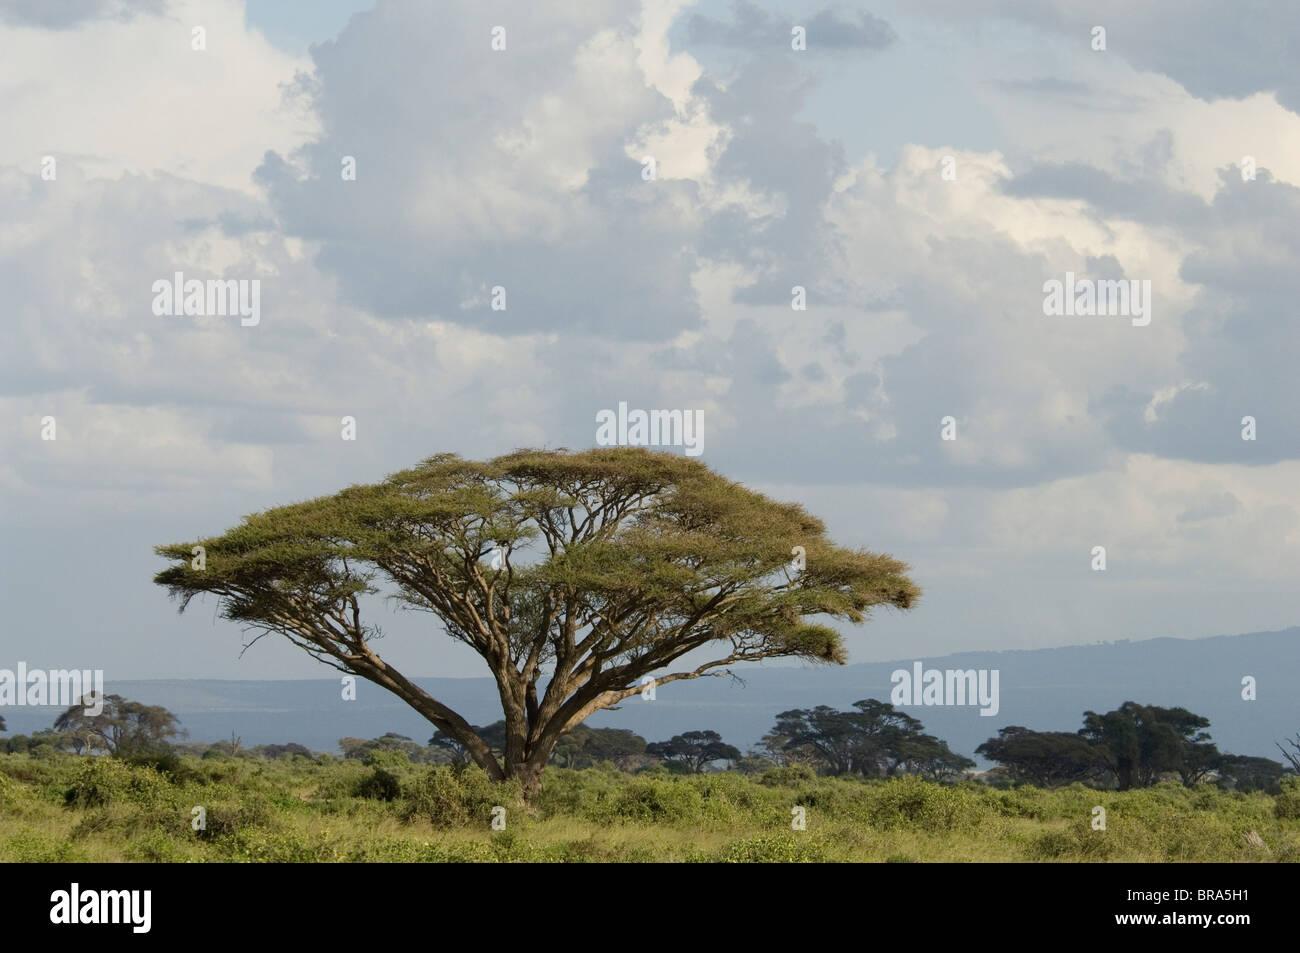 ACACIA pittoresque du PARC NATIONAL D'AMBOSELI KENYA AFRIQUE Photo Stock